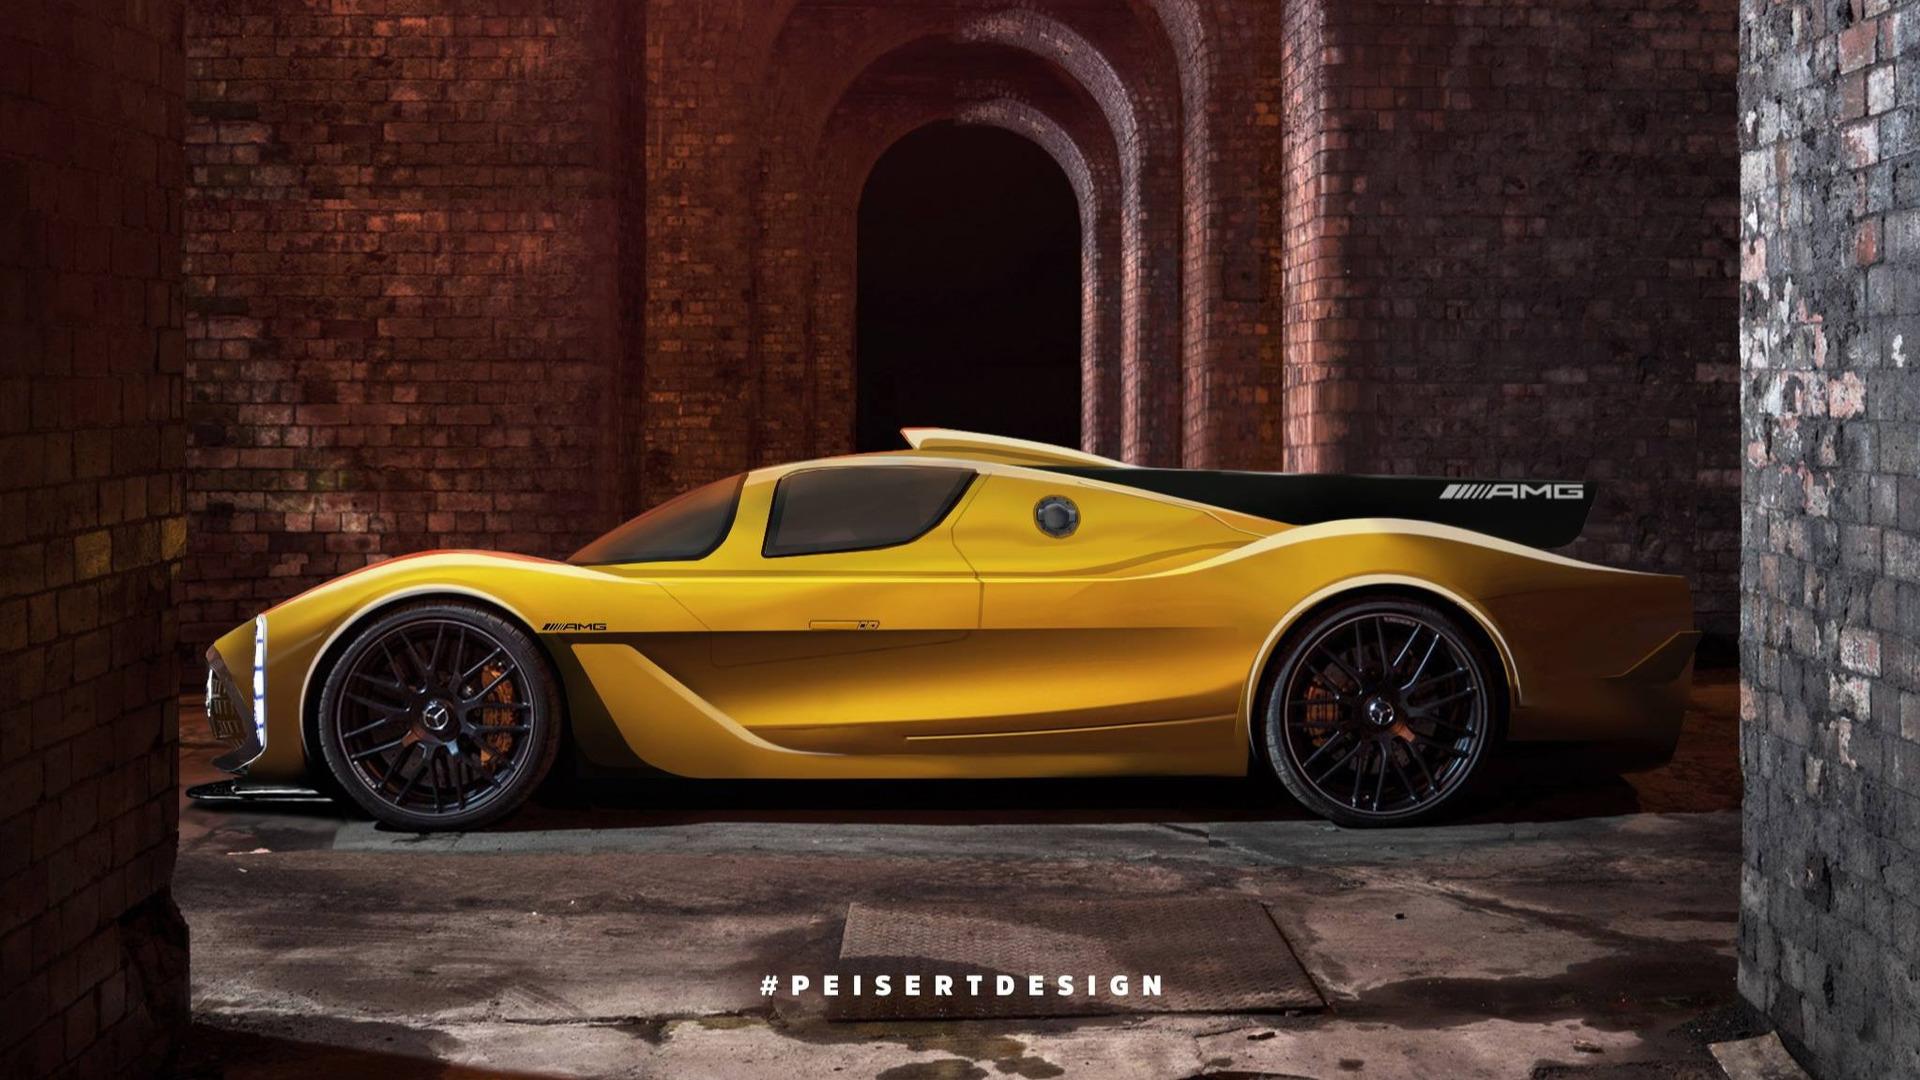 https://storage.googleapis.com/gtspirit/uploads/2017/04/Mercedes-AMG-Project-One.jpg